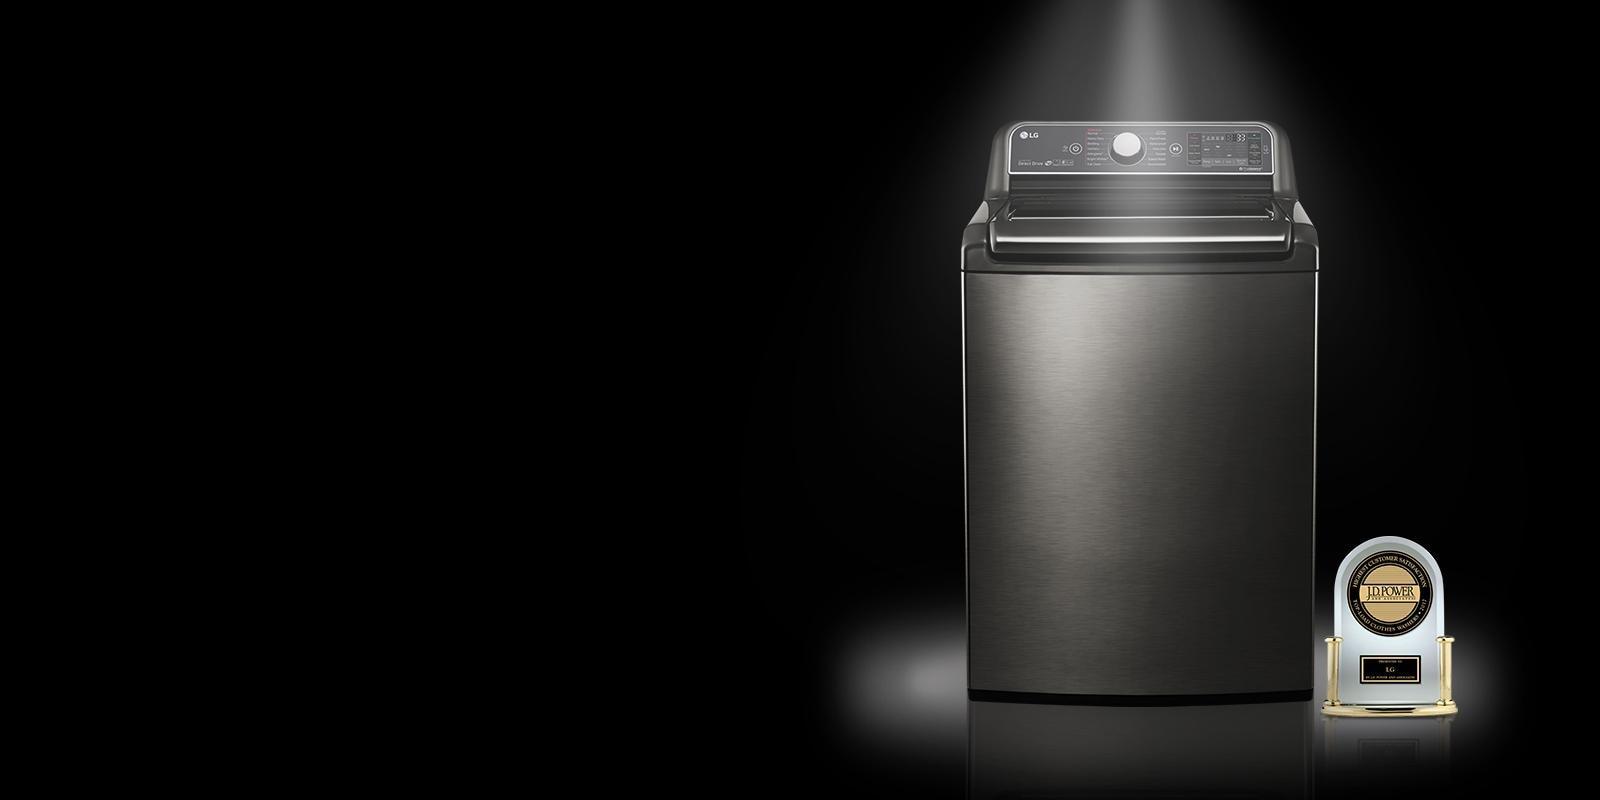 Lg Wt1901cw Large Top Load Smartthinq Washer W Turbowash